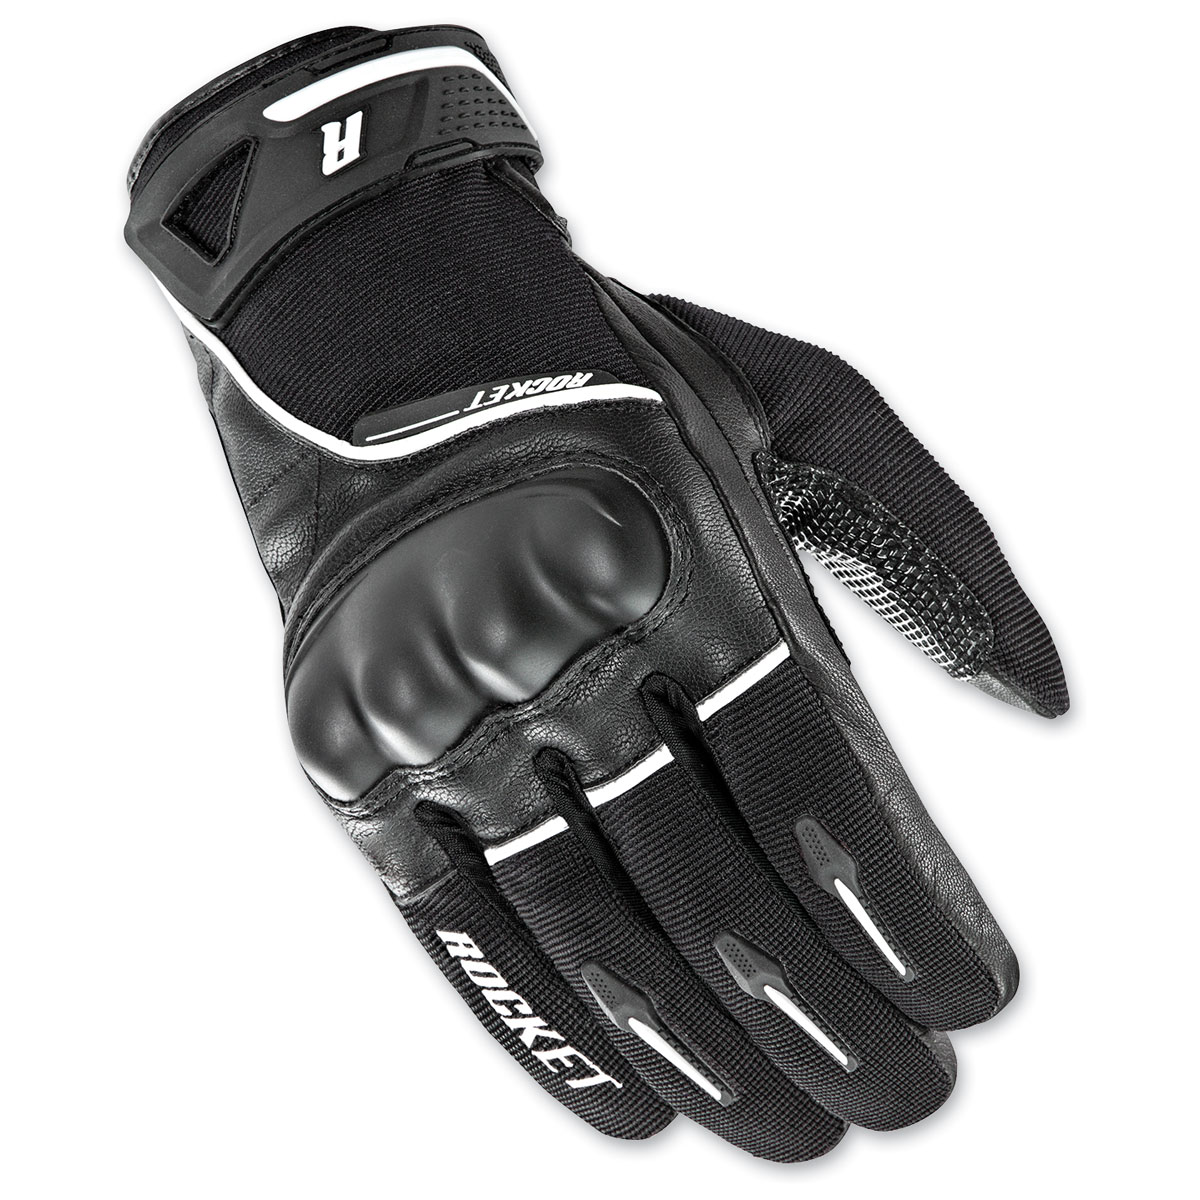 Joe Rocket Men's Super Moto Black/White Gloves